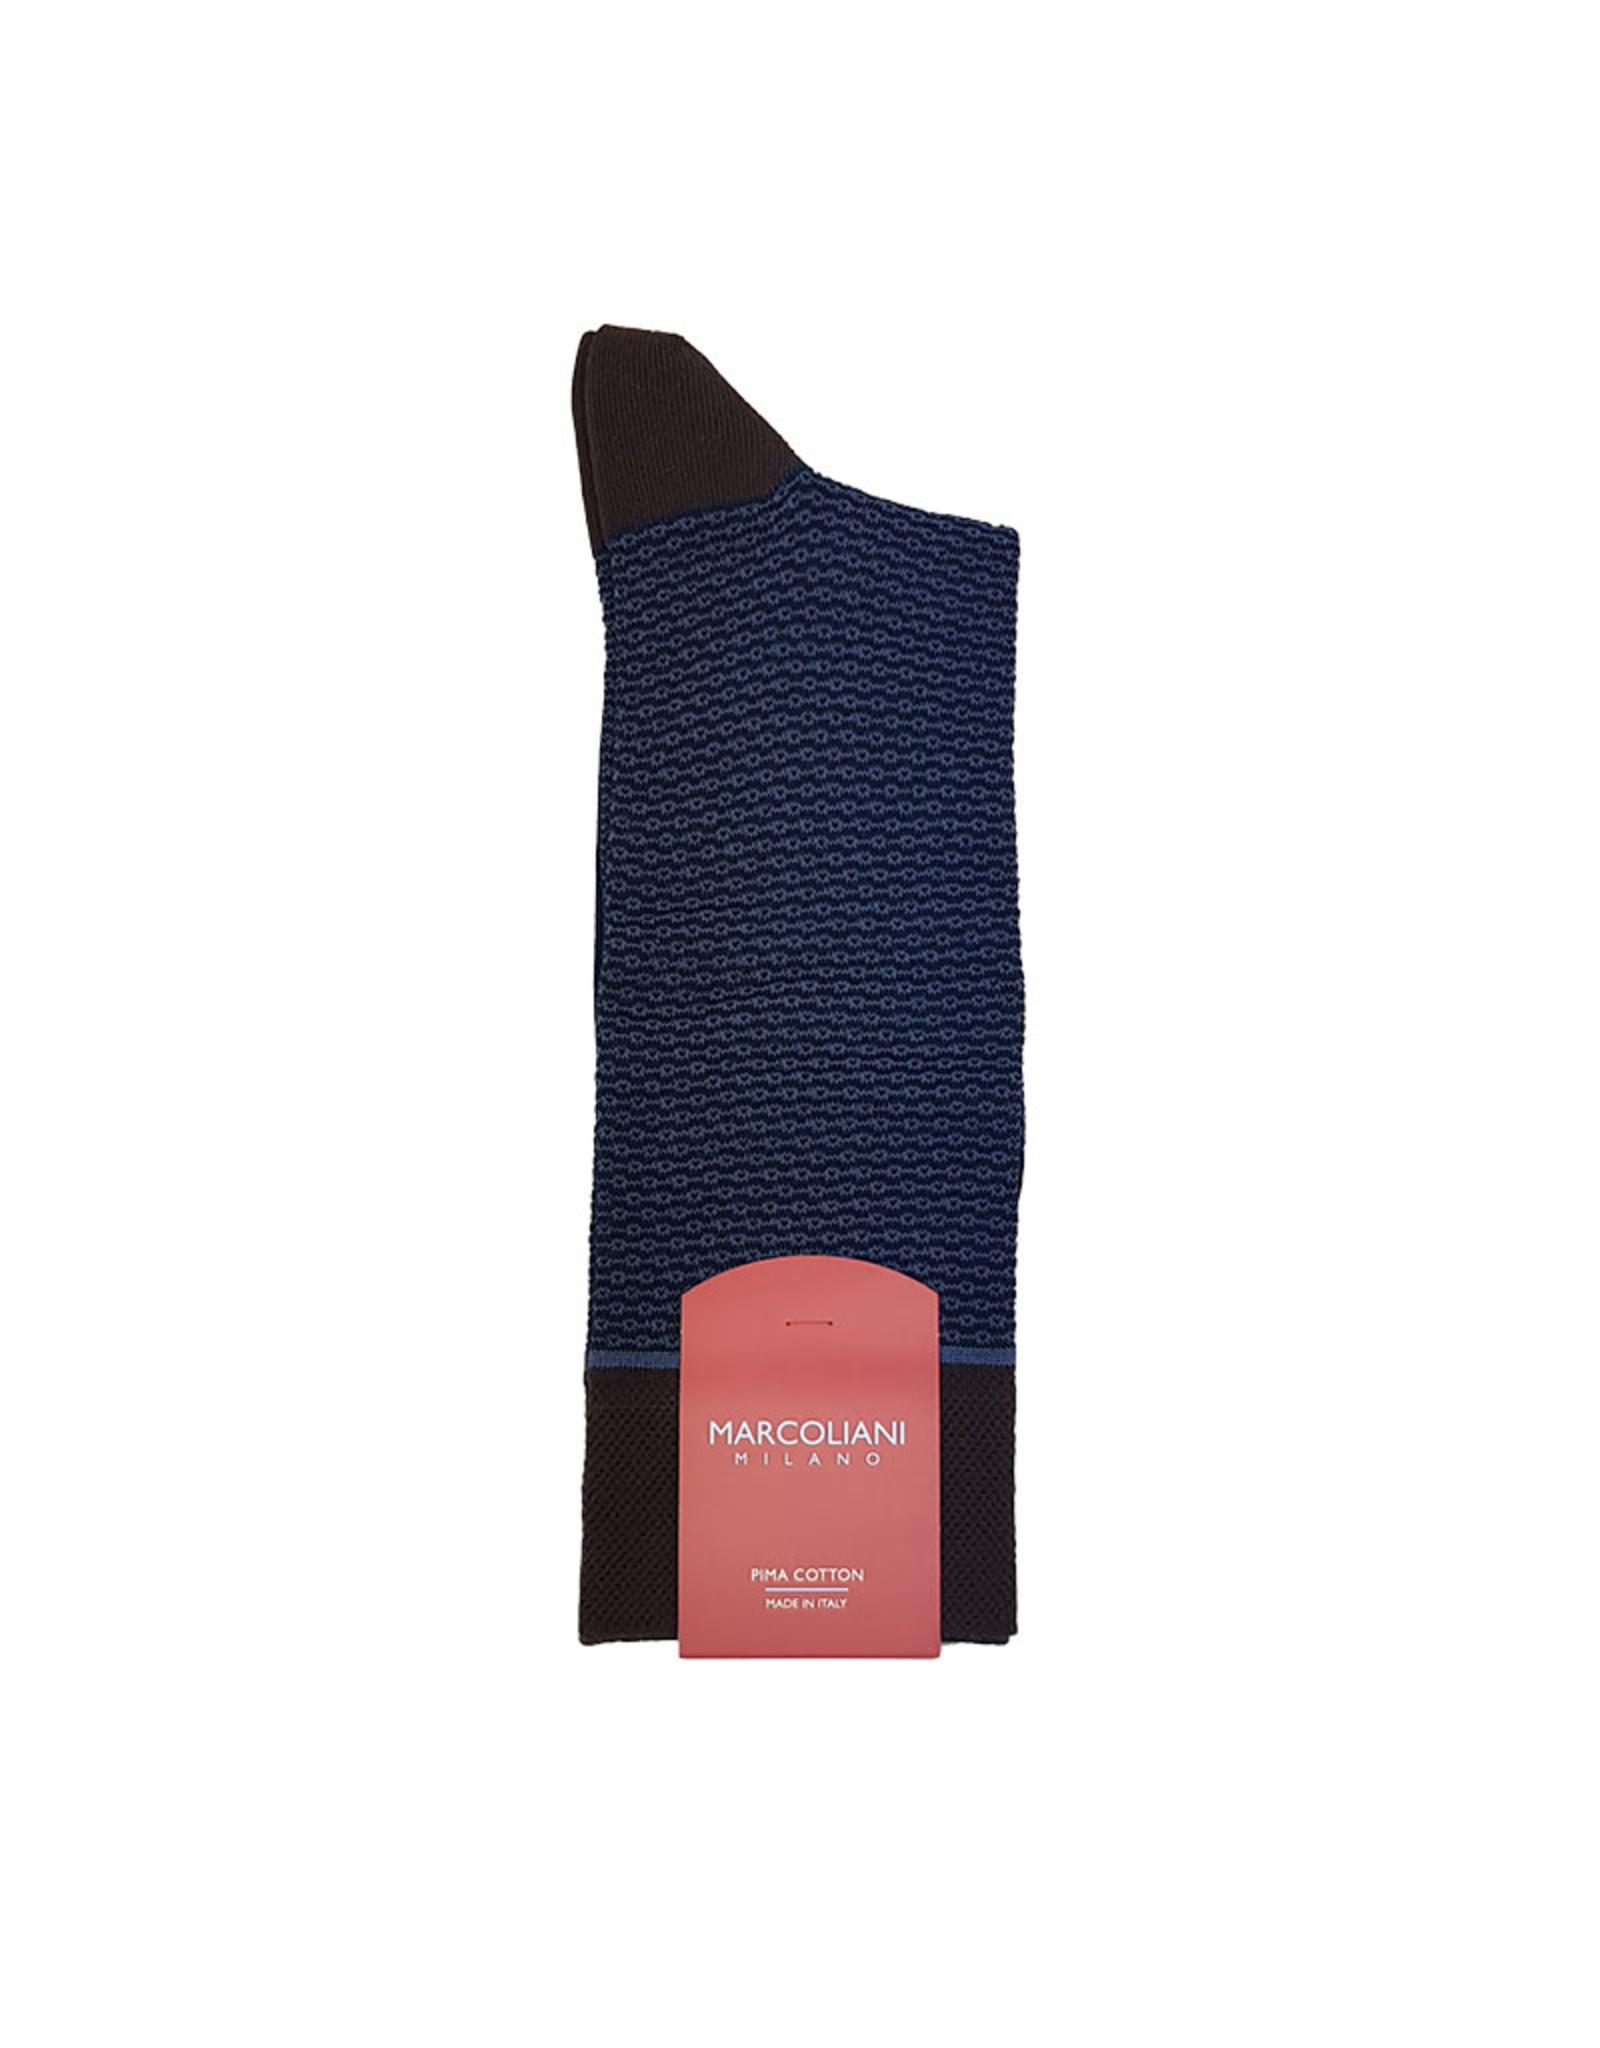 Marcoliani Marcoliani sokken blauw-bruin 4189T/001